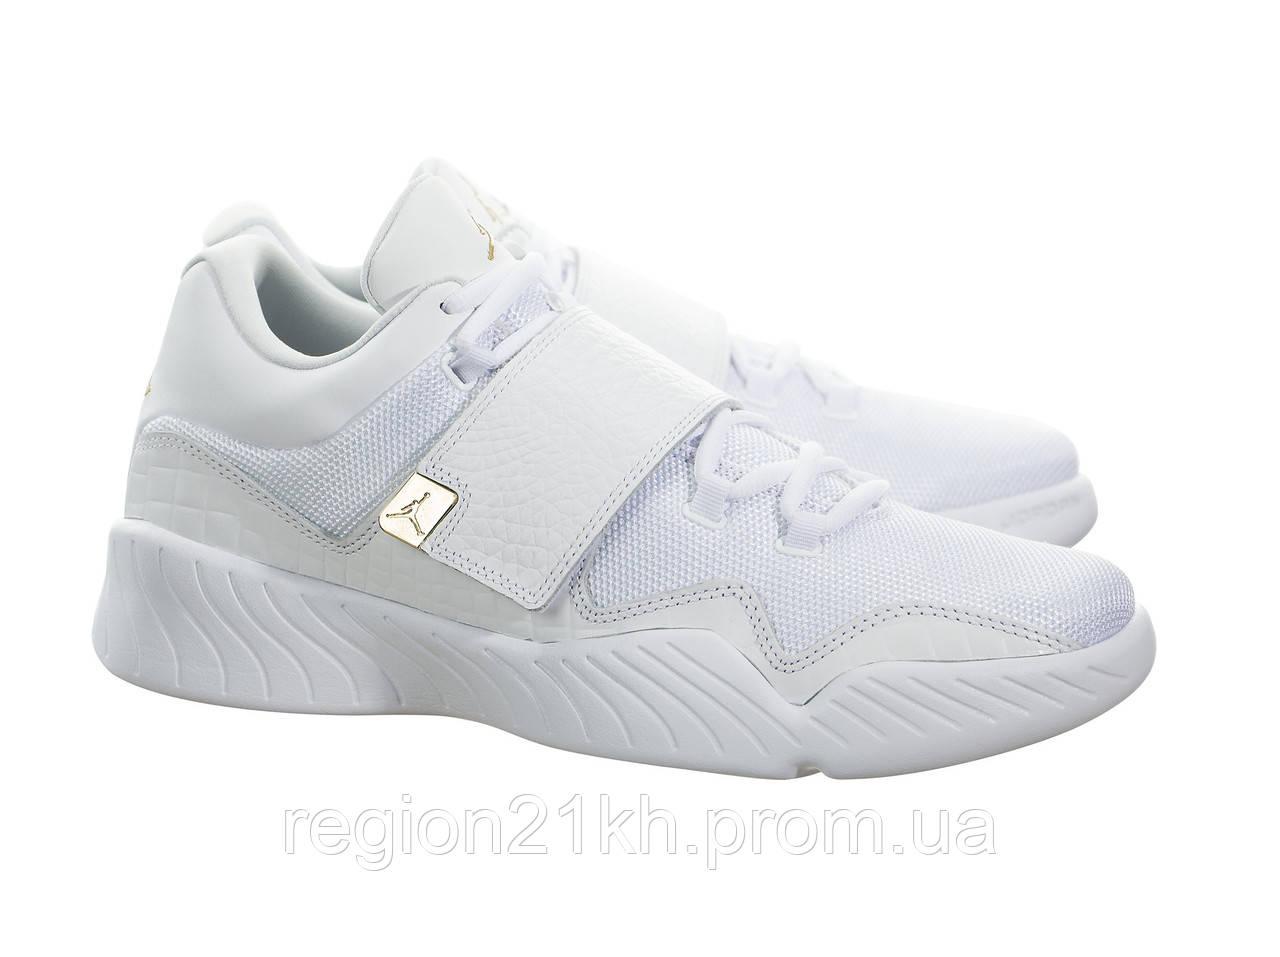 catch get new recognized brands Тренинговые кроссовки Nike Air Jordan J23 Trainer White Gold